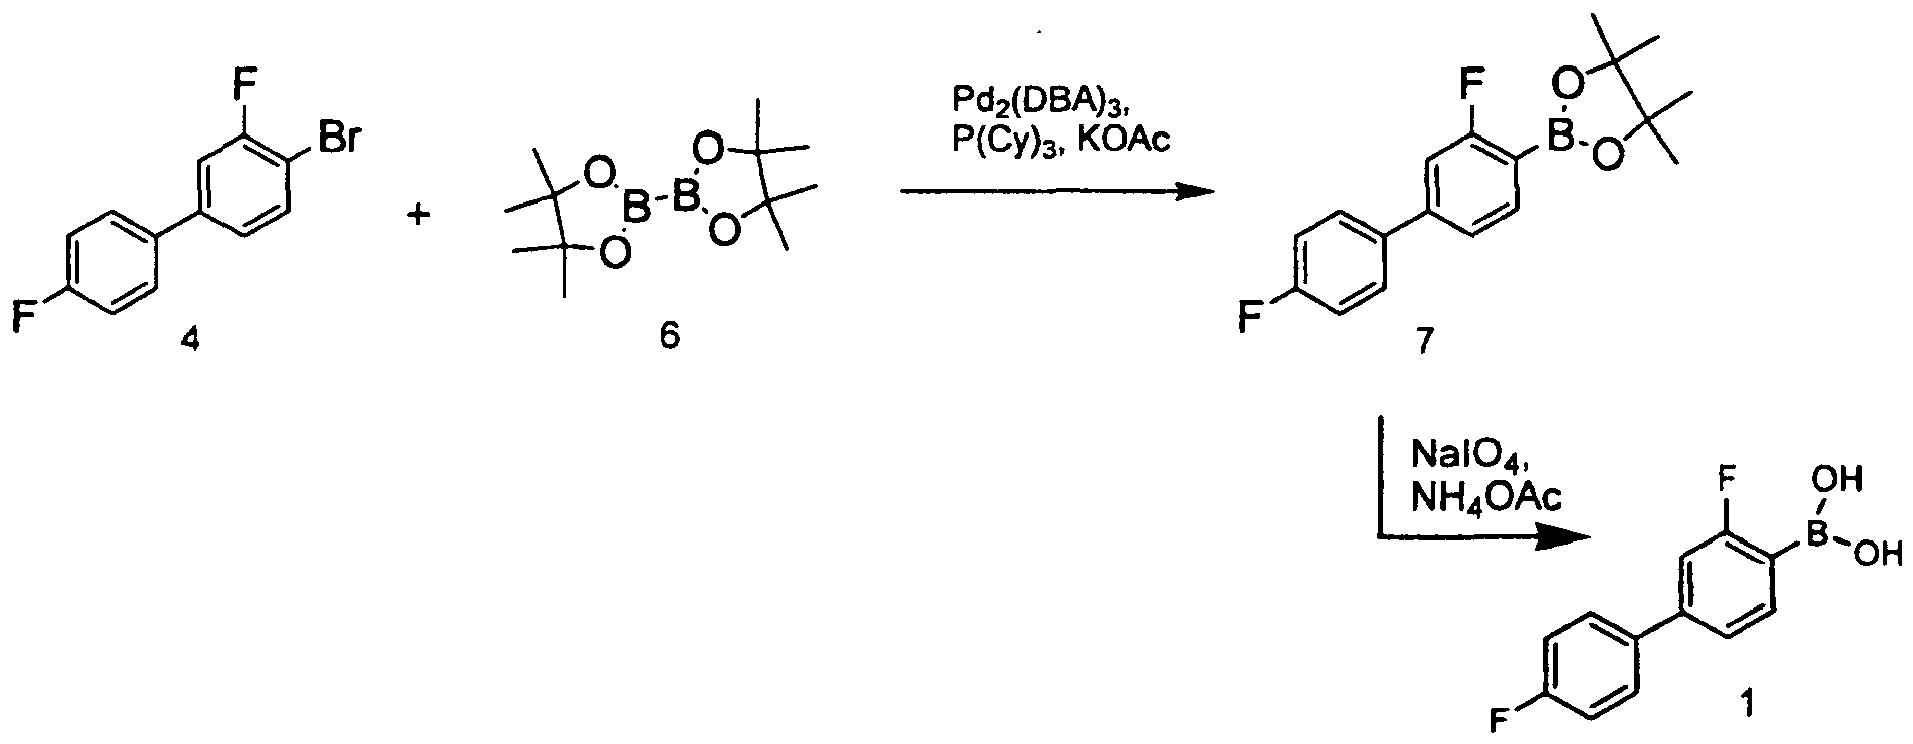 Figure imgb0667